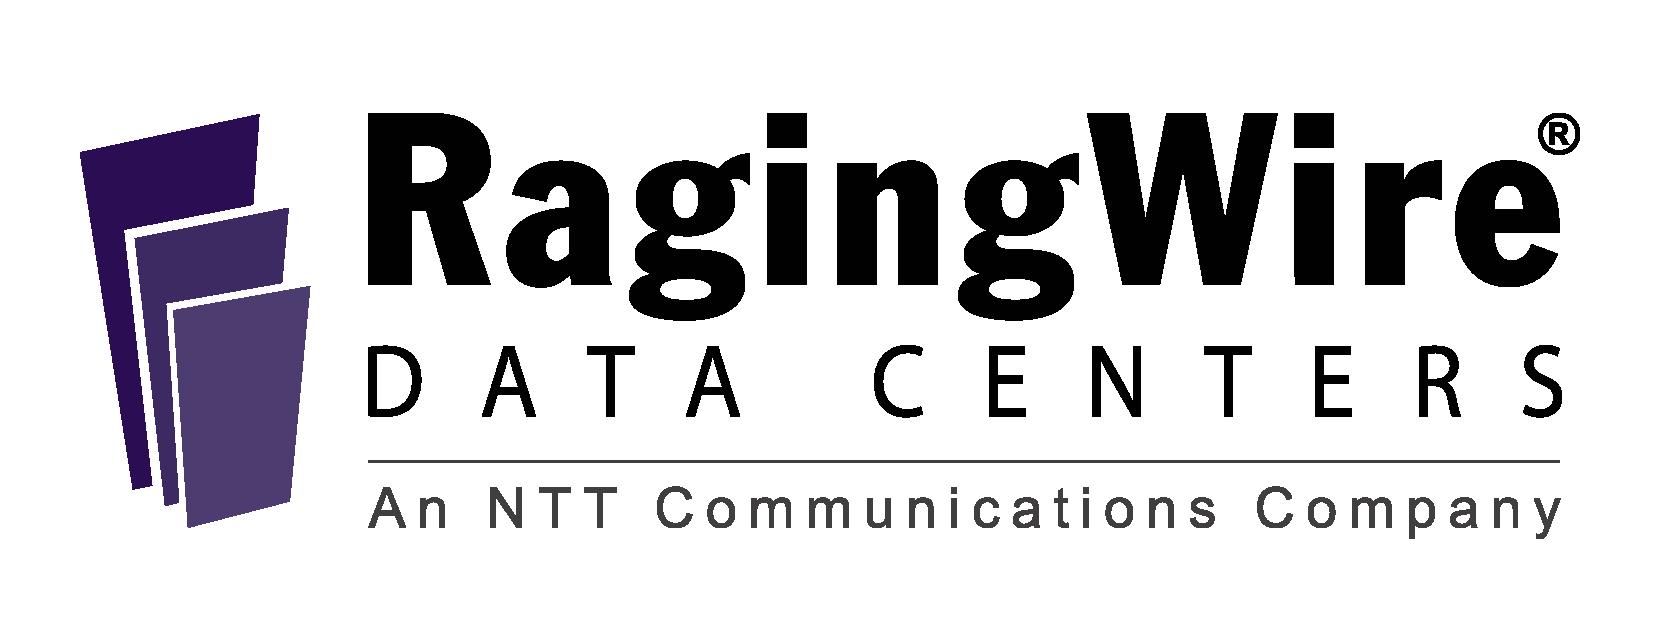 RagingWire Data Centers logo